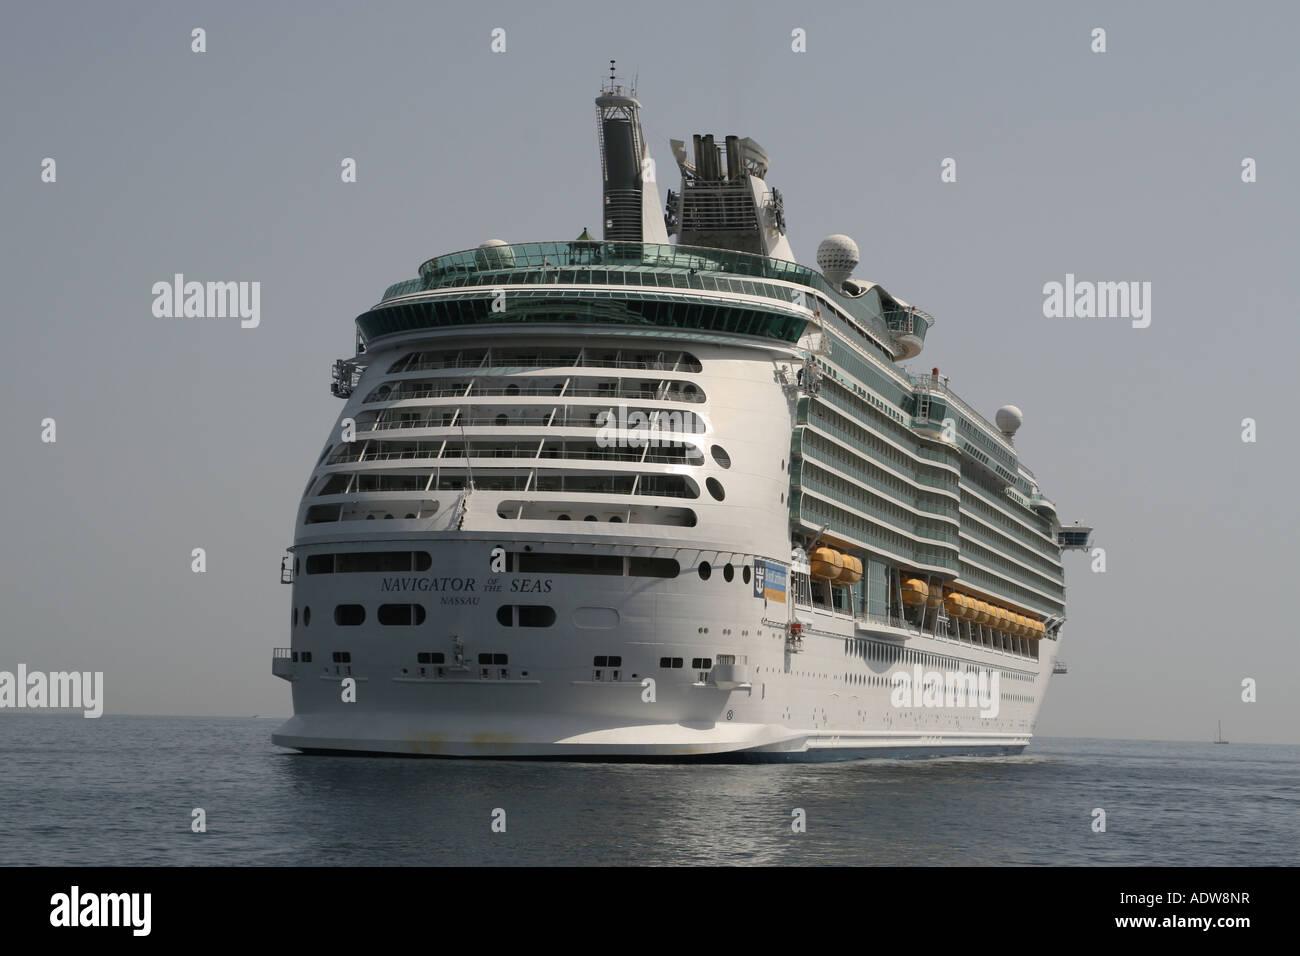 Royal Caribbean cruise ship Navigator of the Seas at anchor in Villefranche - Stock Image